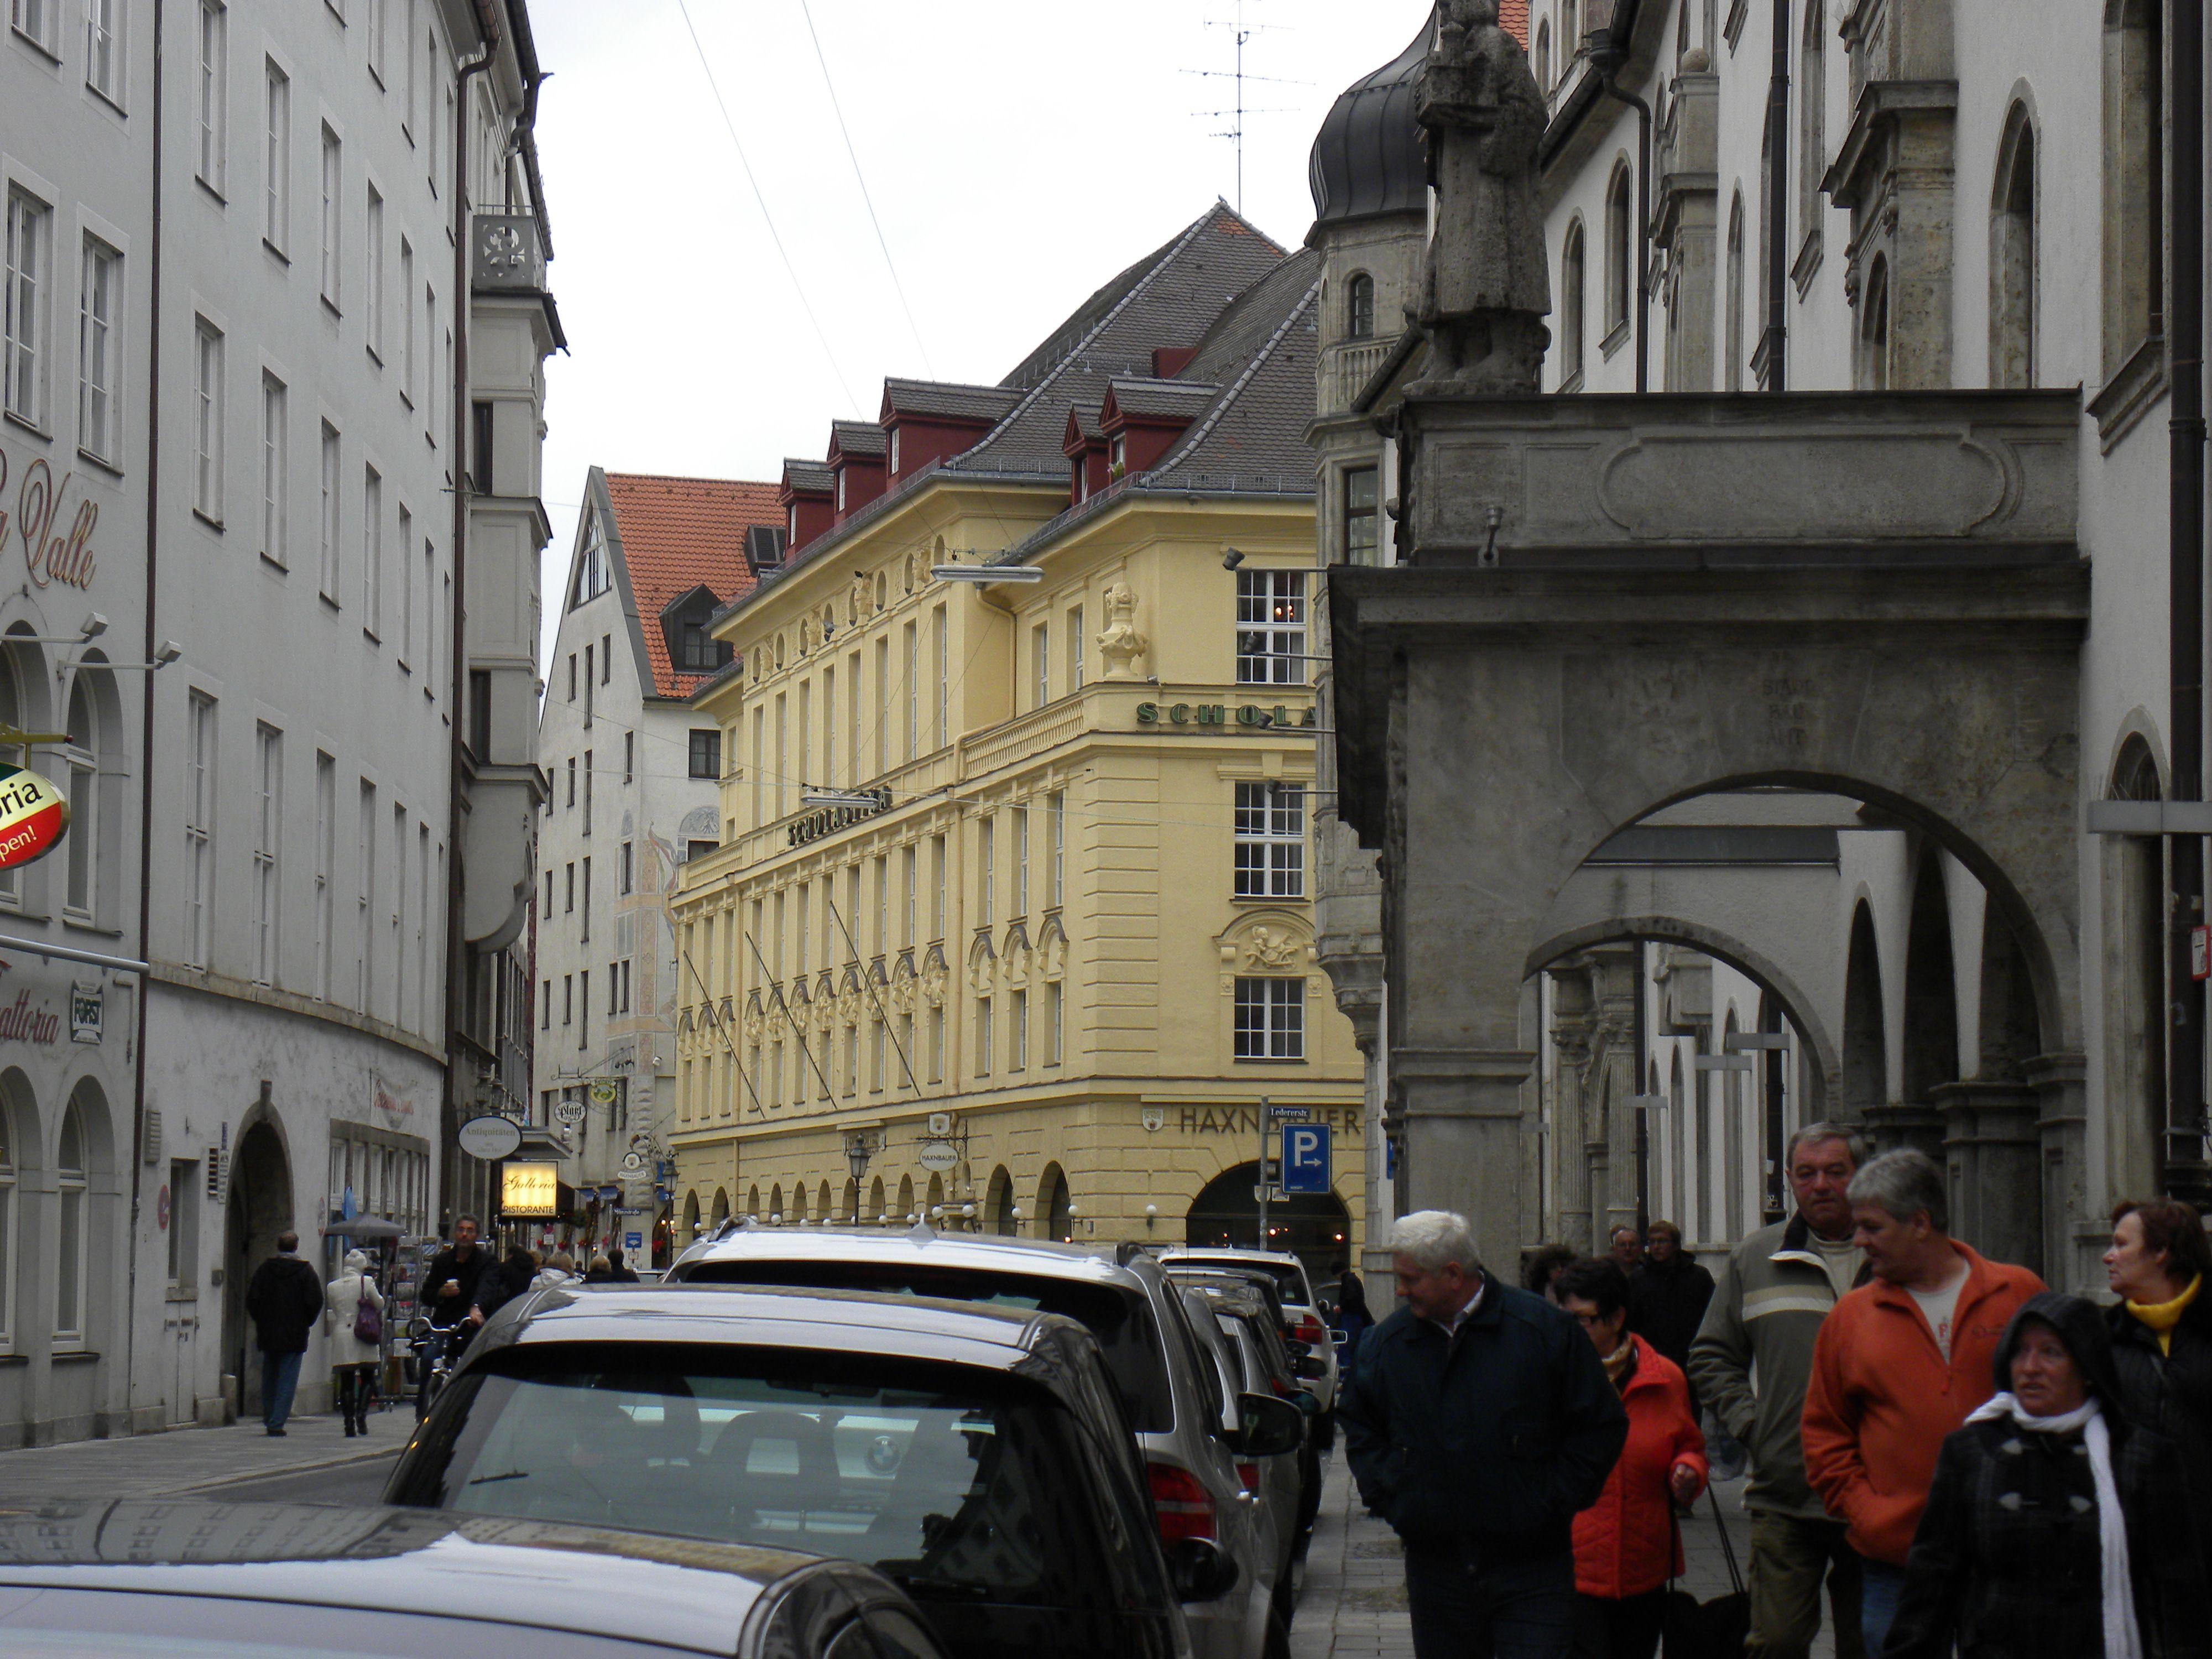 December day in Munich. Street view